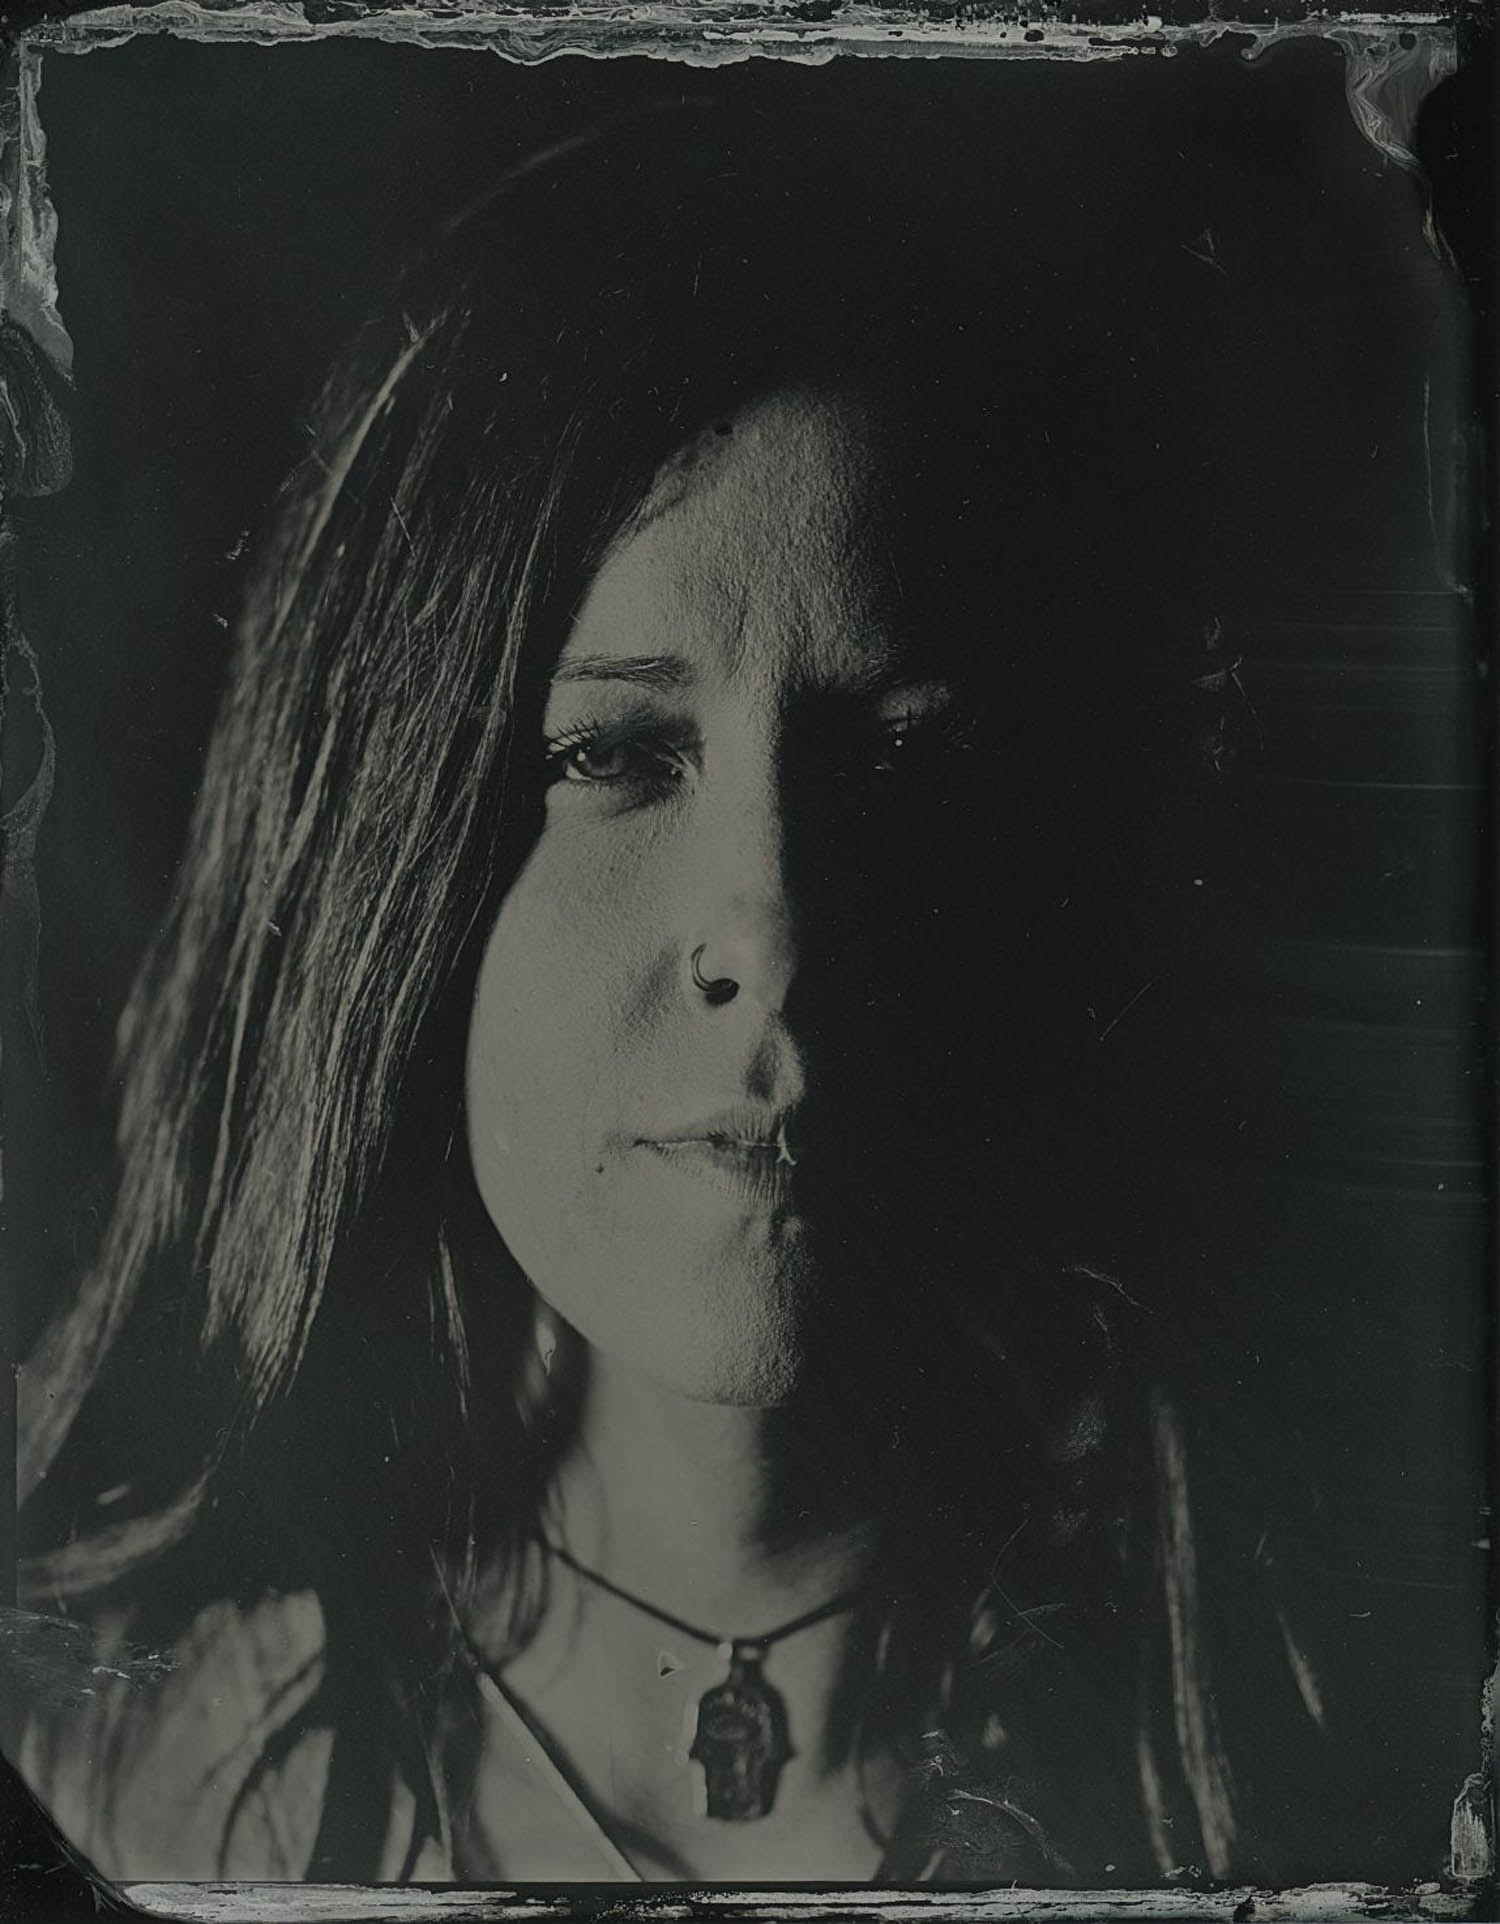 Julia, 2018 - Tintype